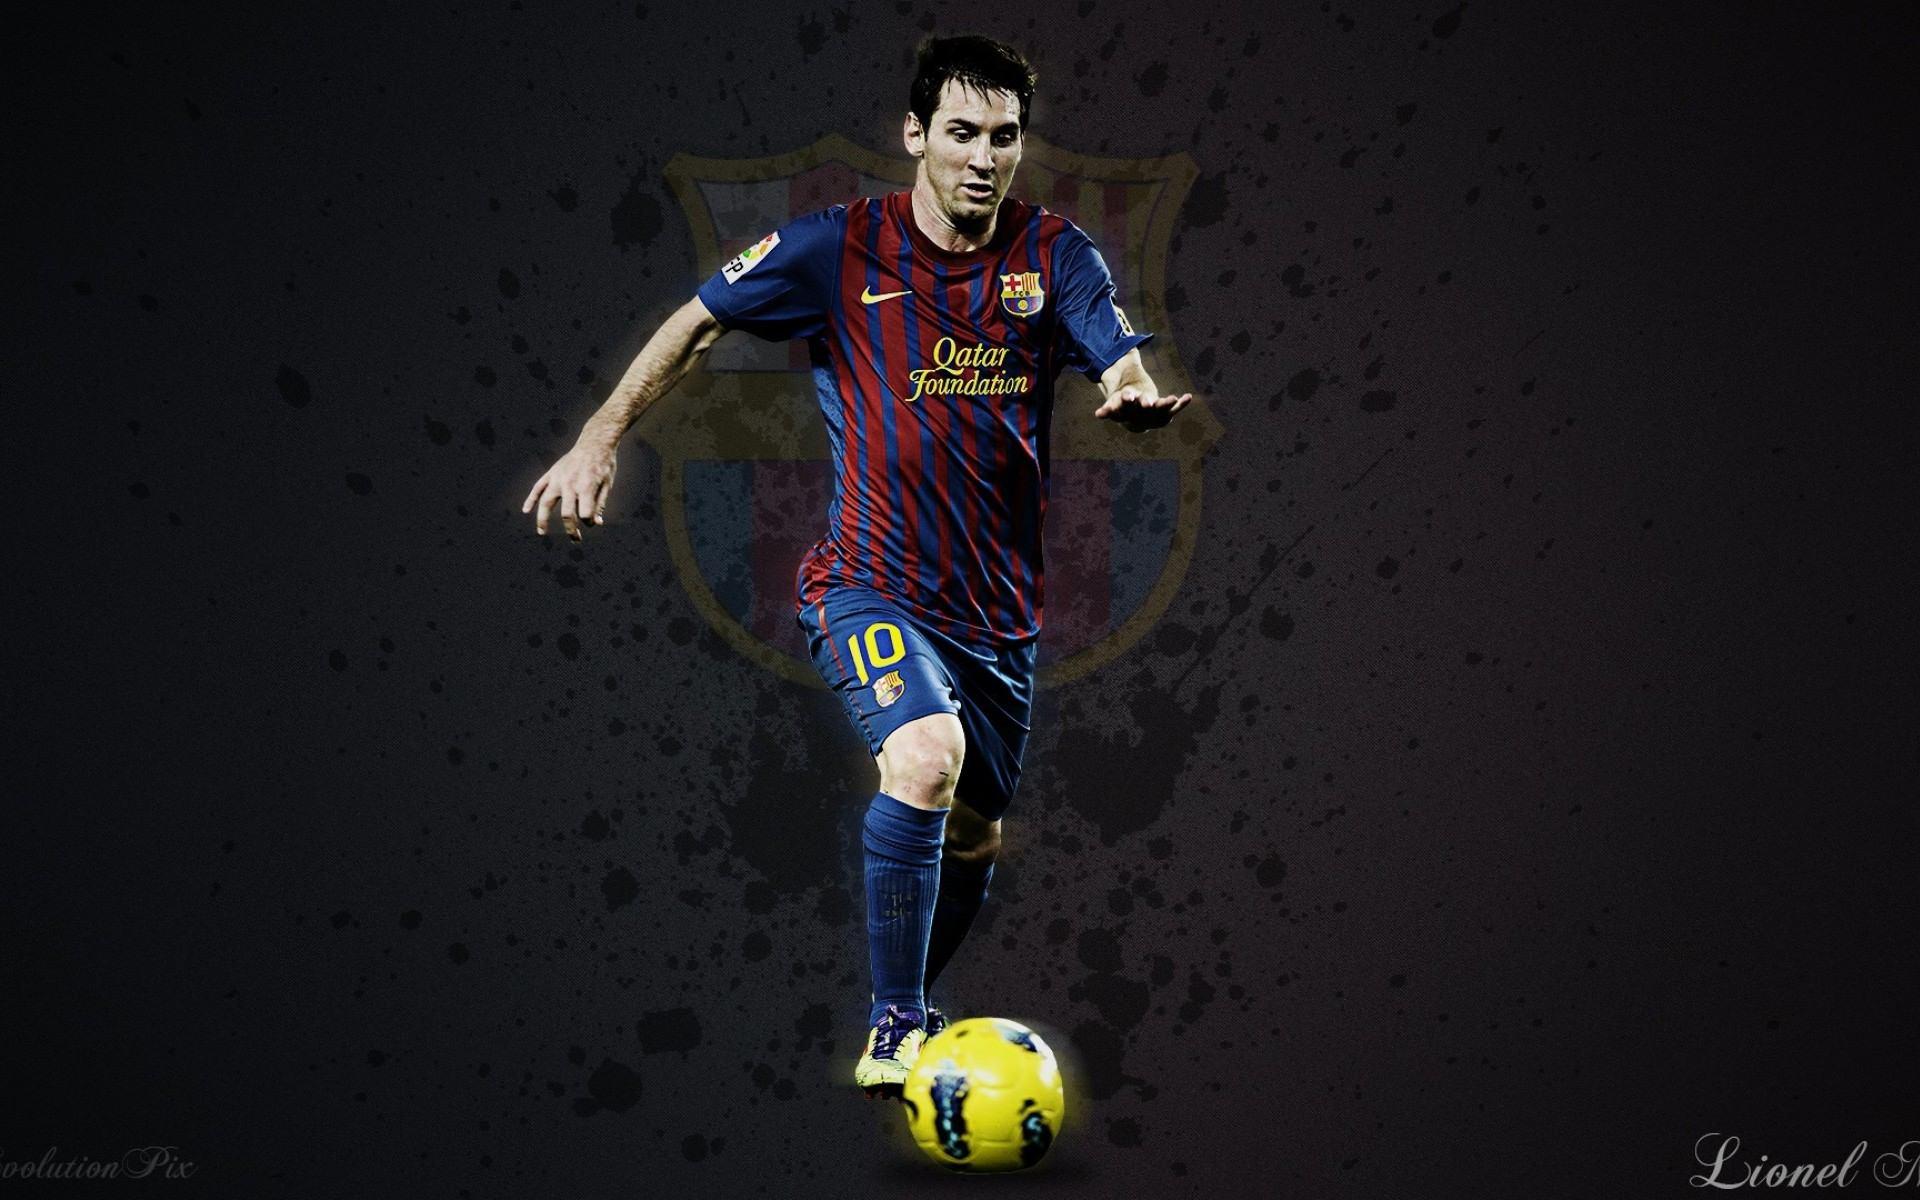 Messi Desktop Background Wallpapers Backgrounds Images Art Photos 1920x1200